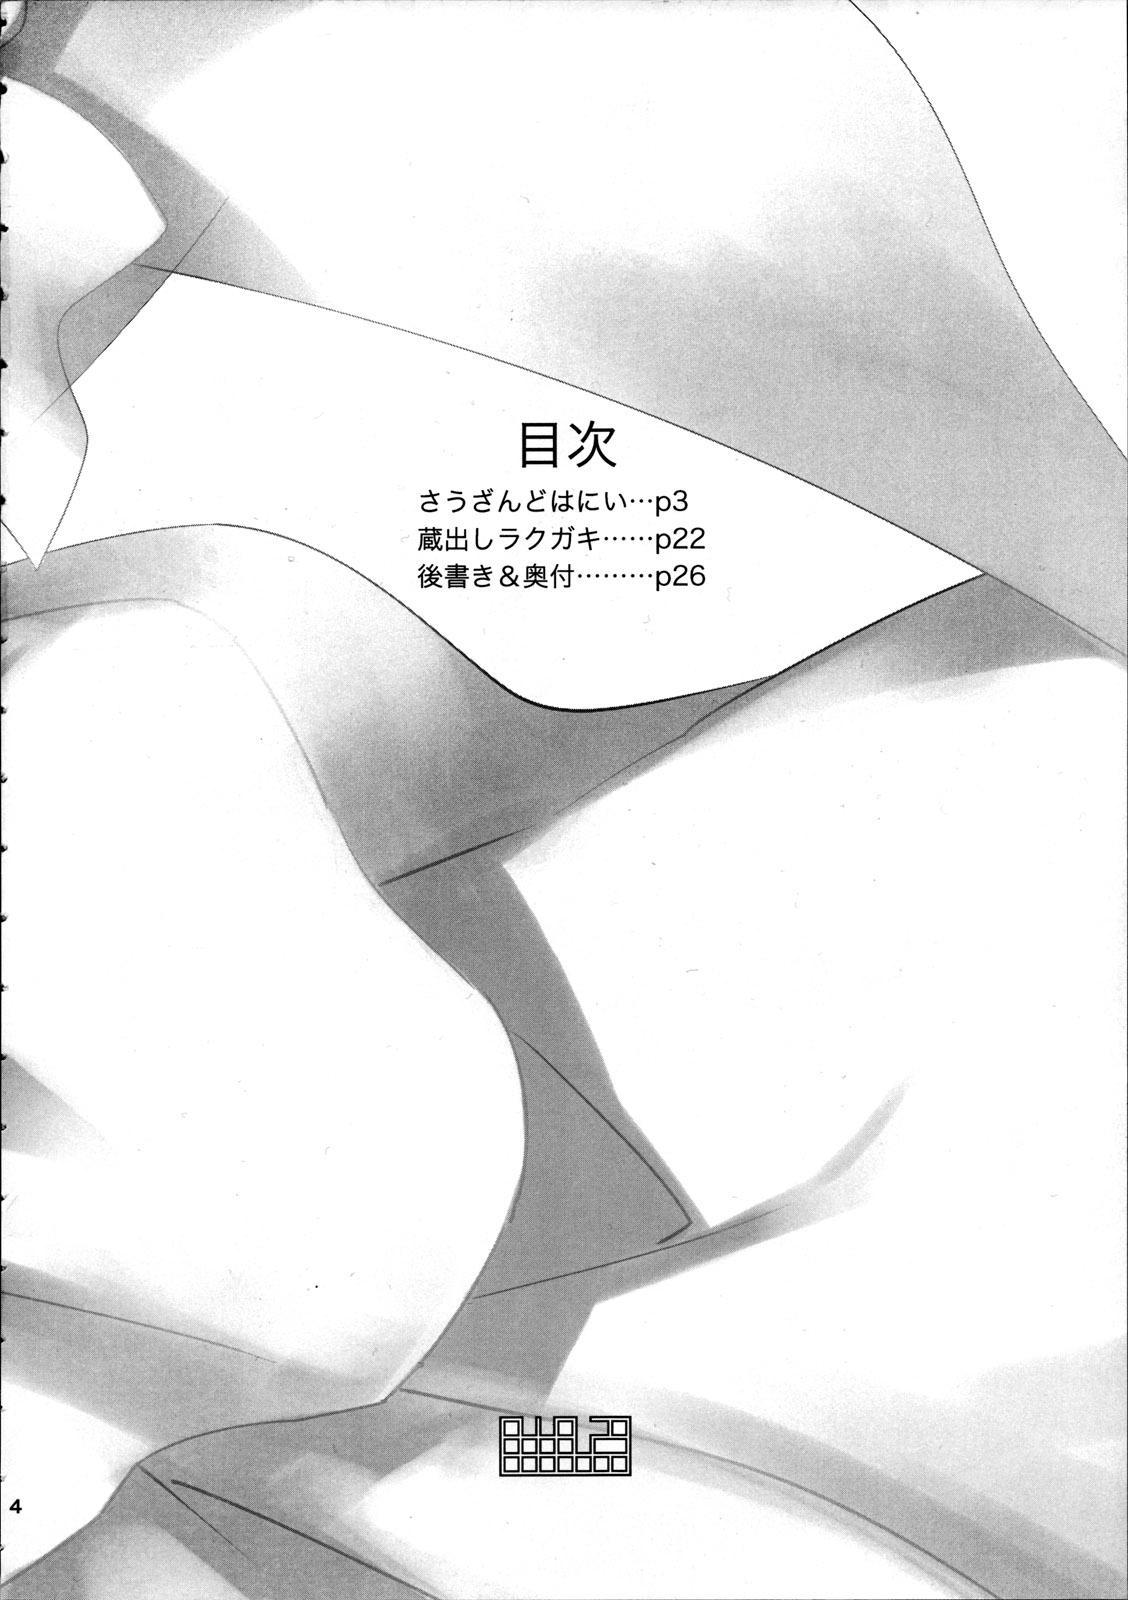 Shinsekai 20